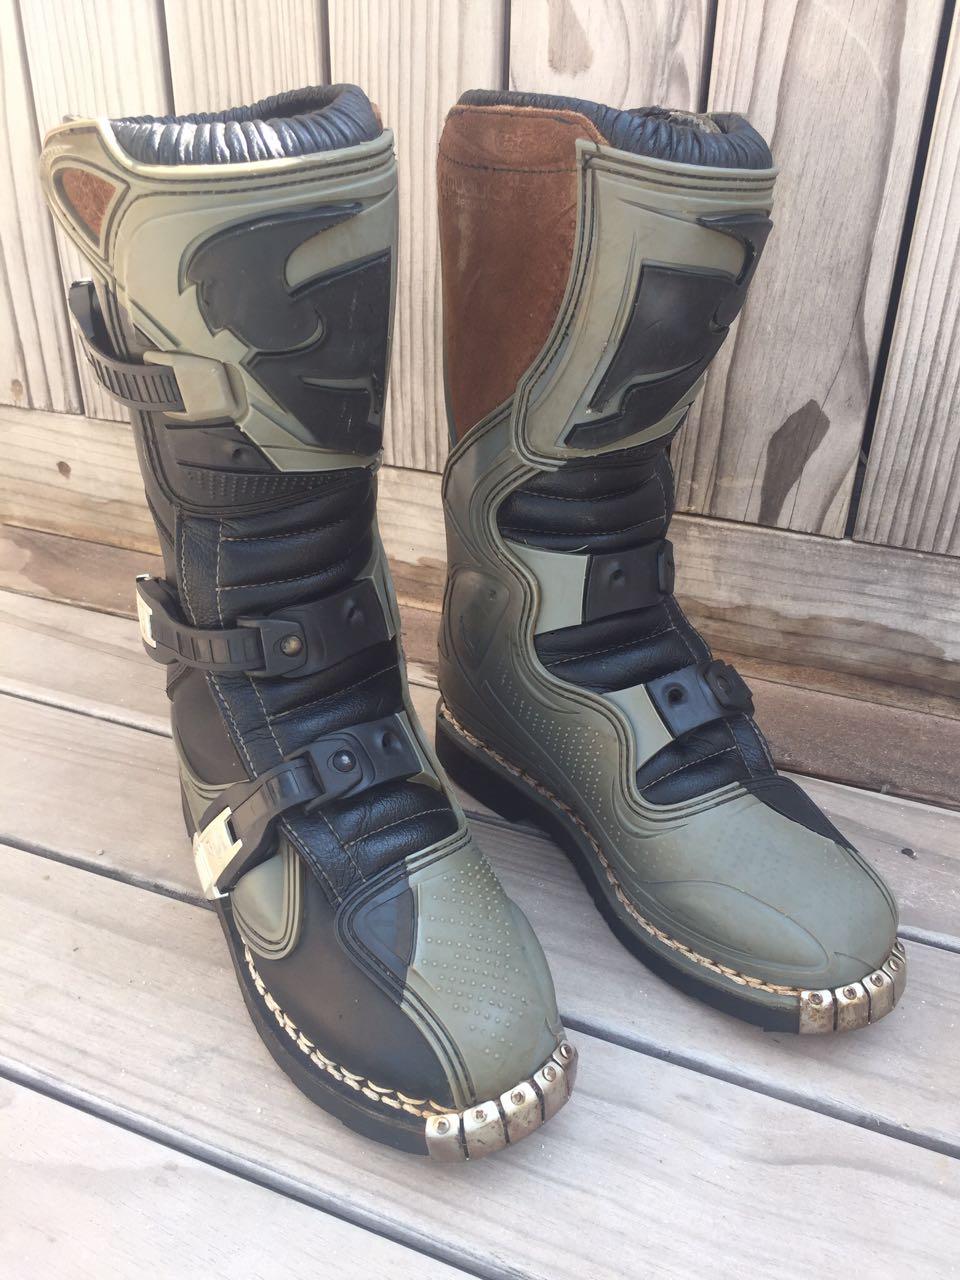 Motor Cross Boots - Junior